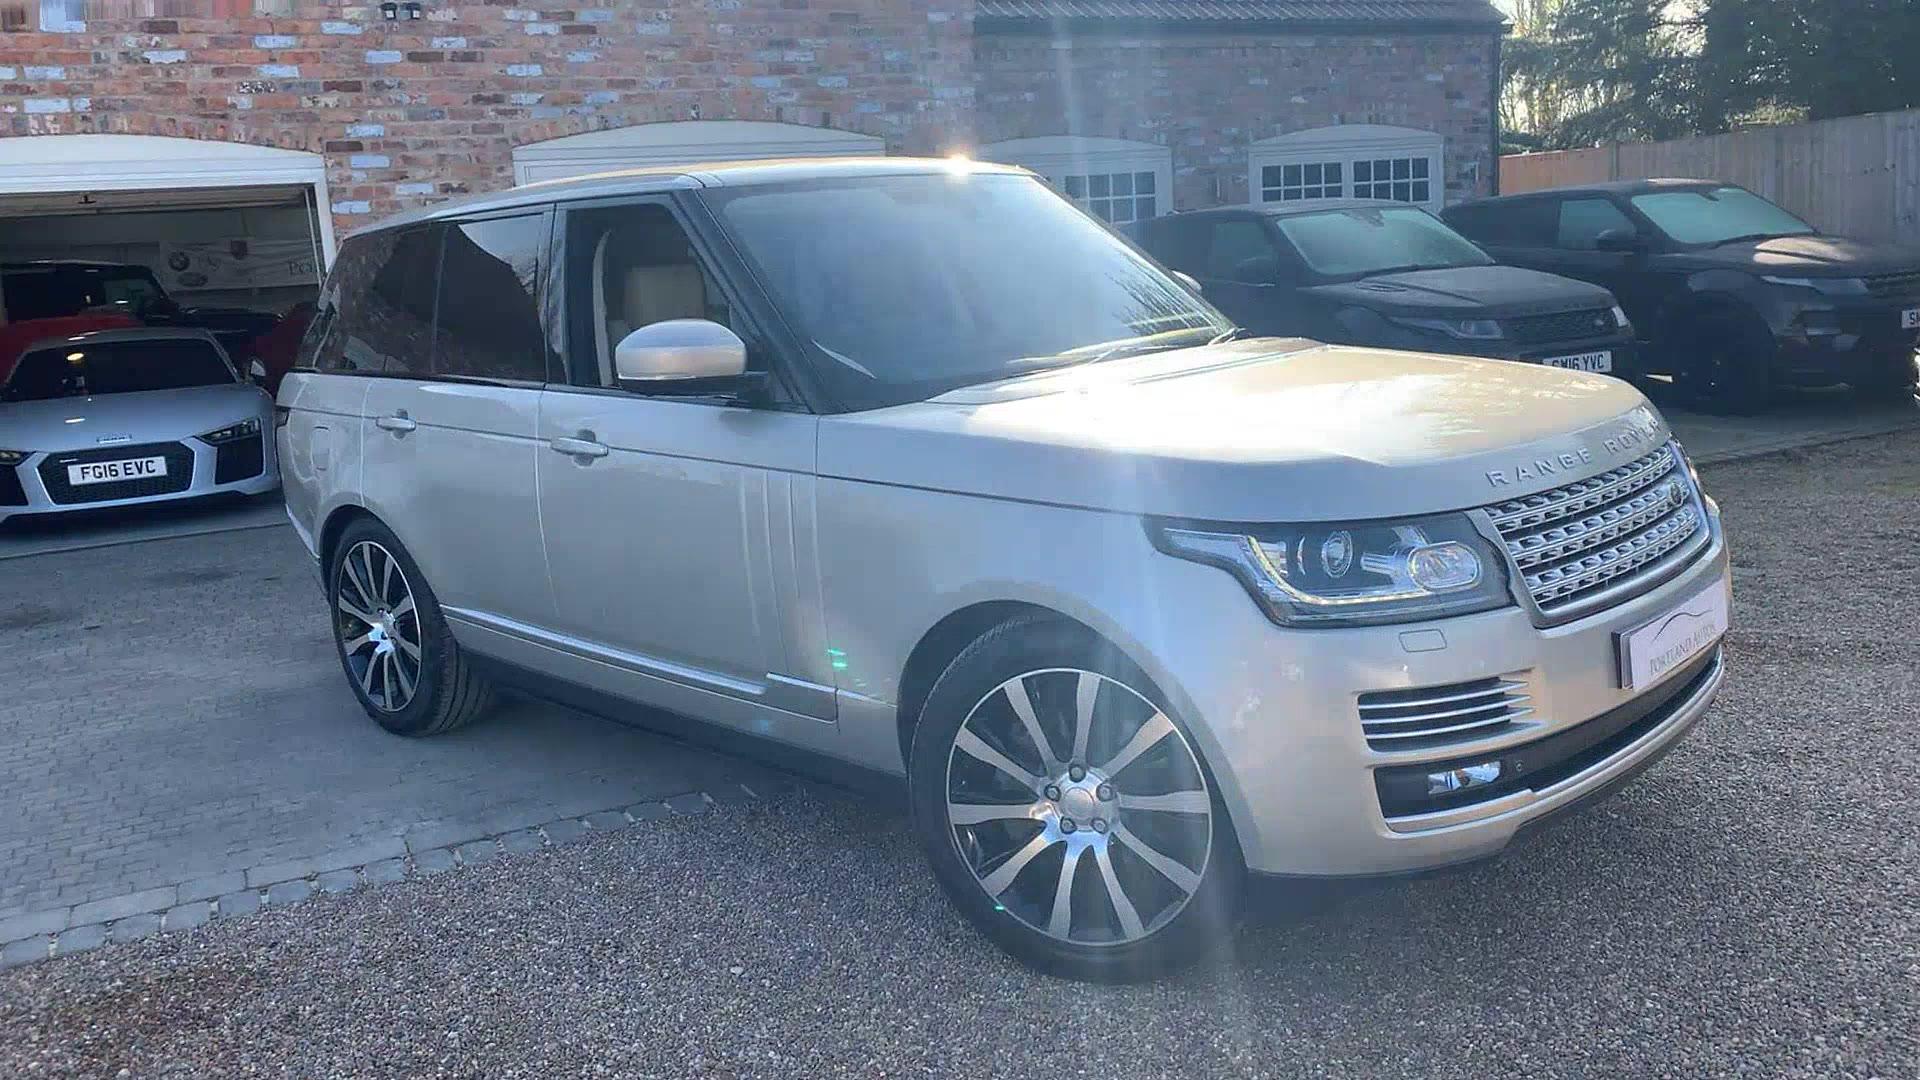 Vehicle 360 Video